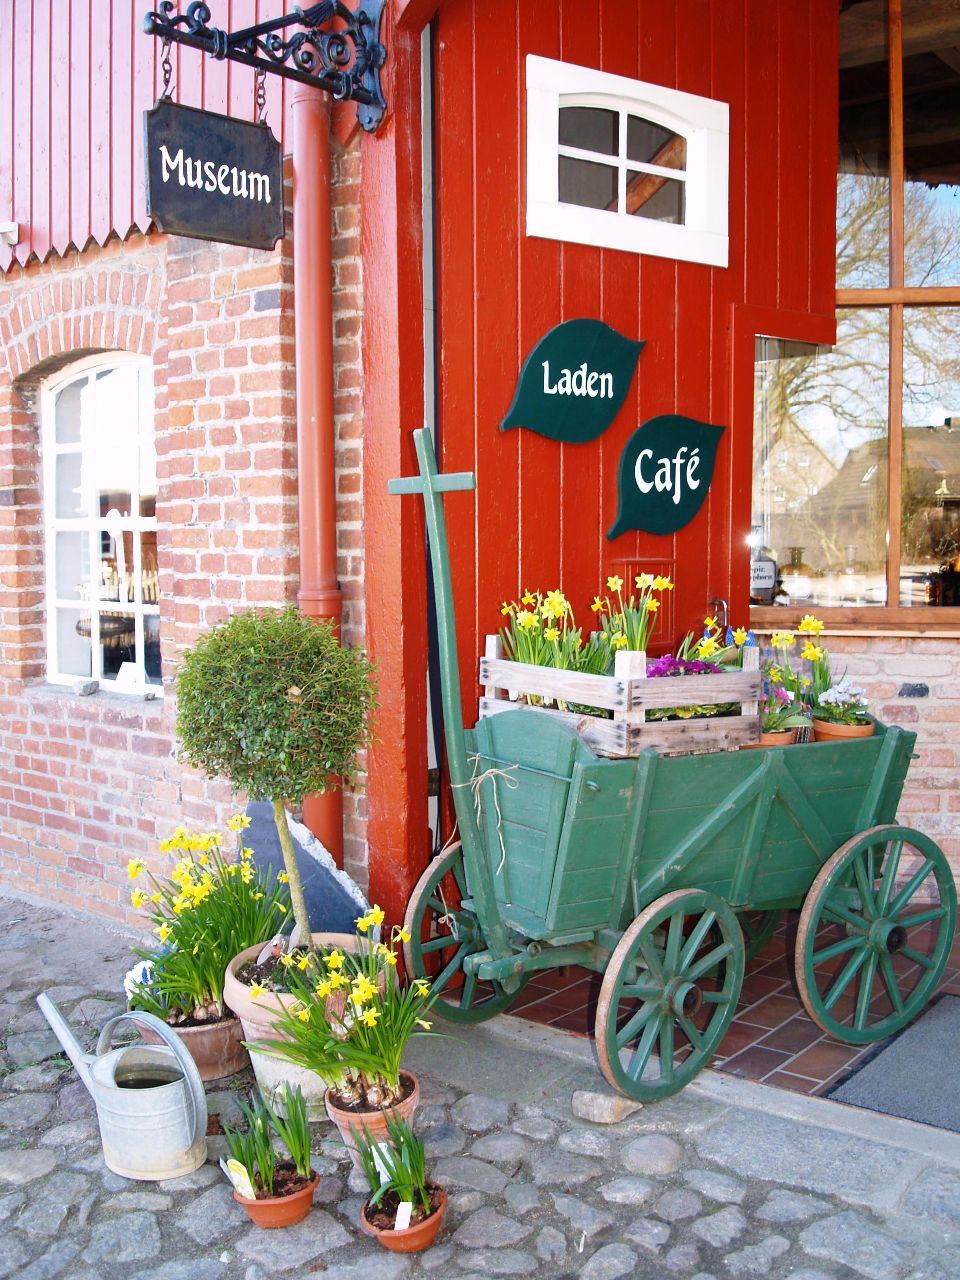 Eingang zum Kräuterladen